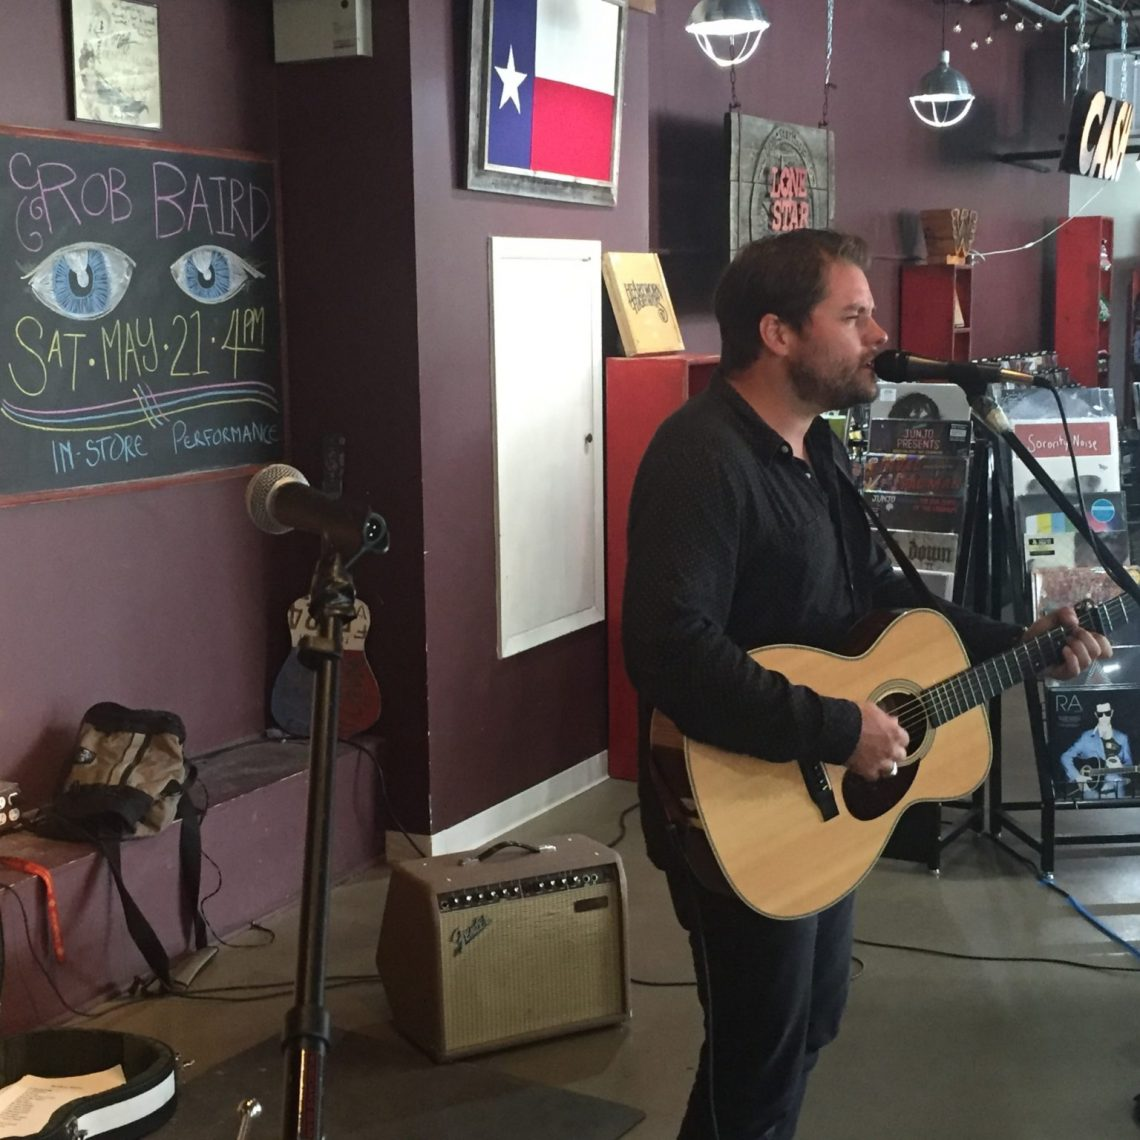 Rob Baird at Superfly's Lone Star Music Emporium in San Marcos, Texas. (Photo by Richard Skanse)